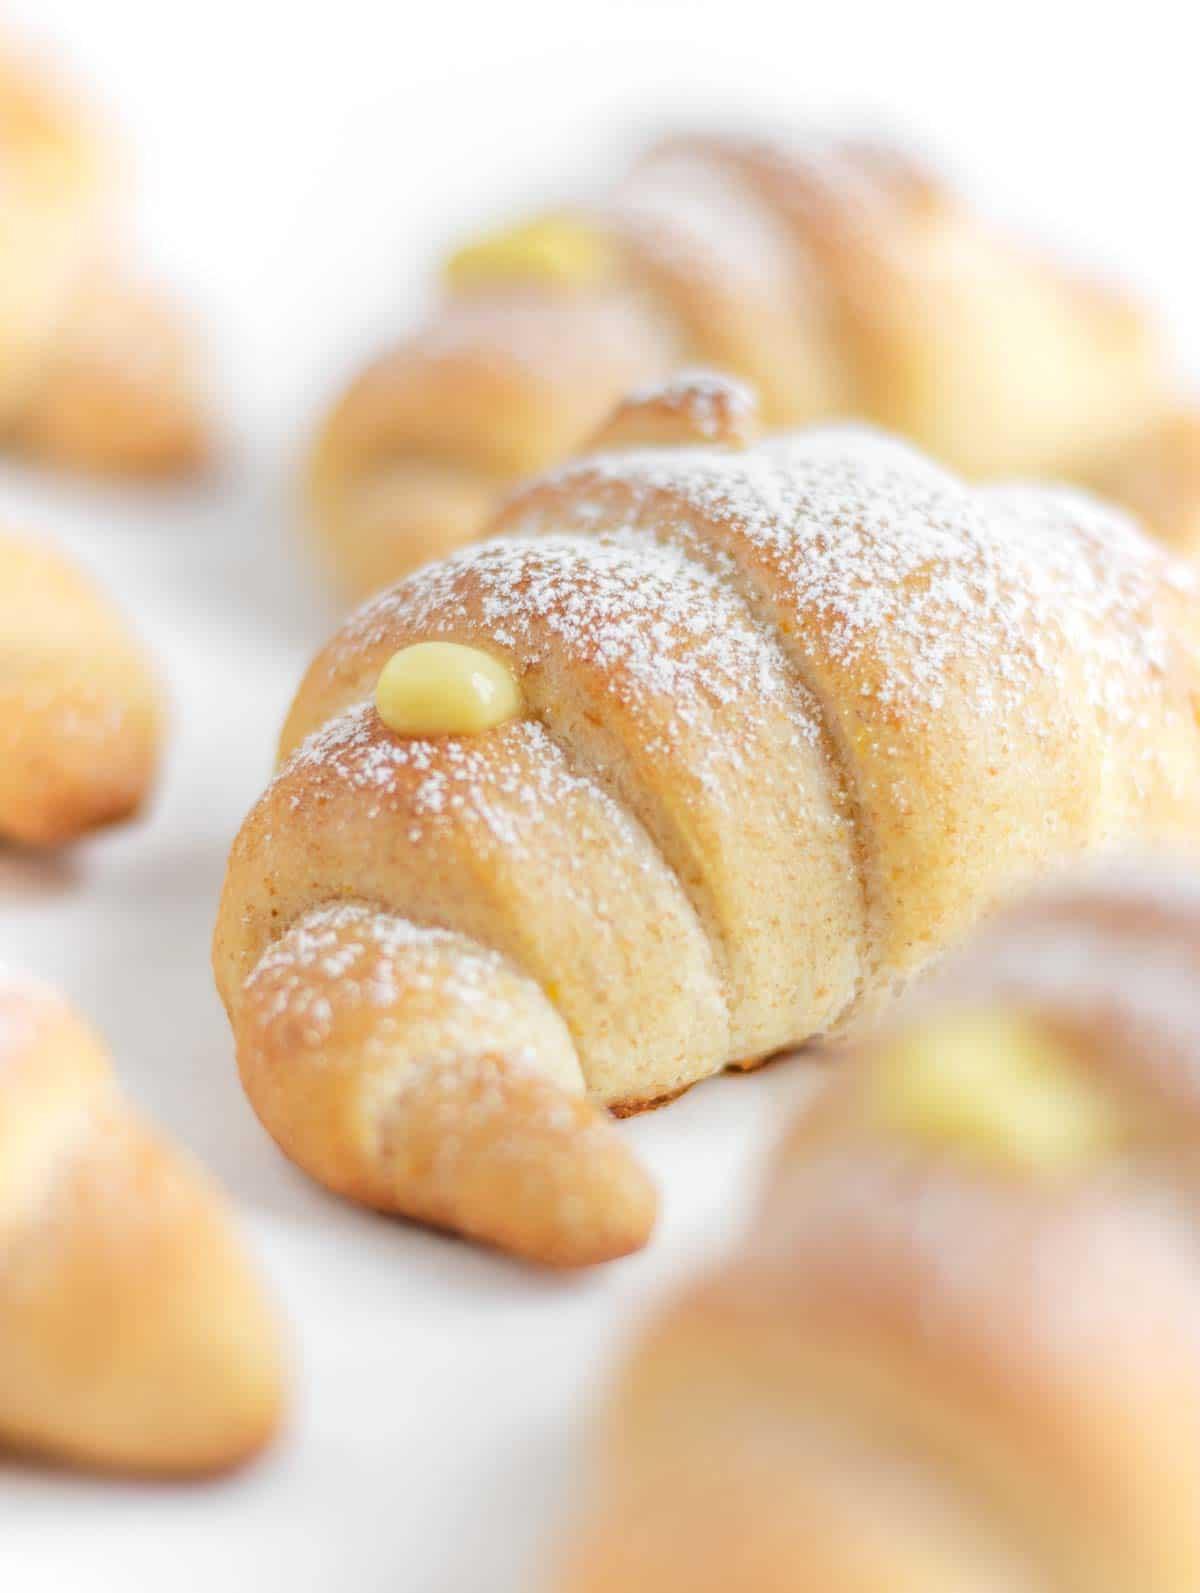 close up of Italian croissant with custard